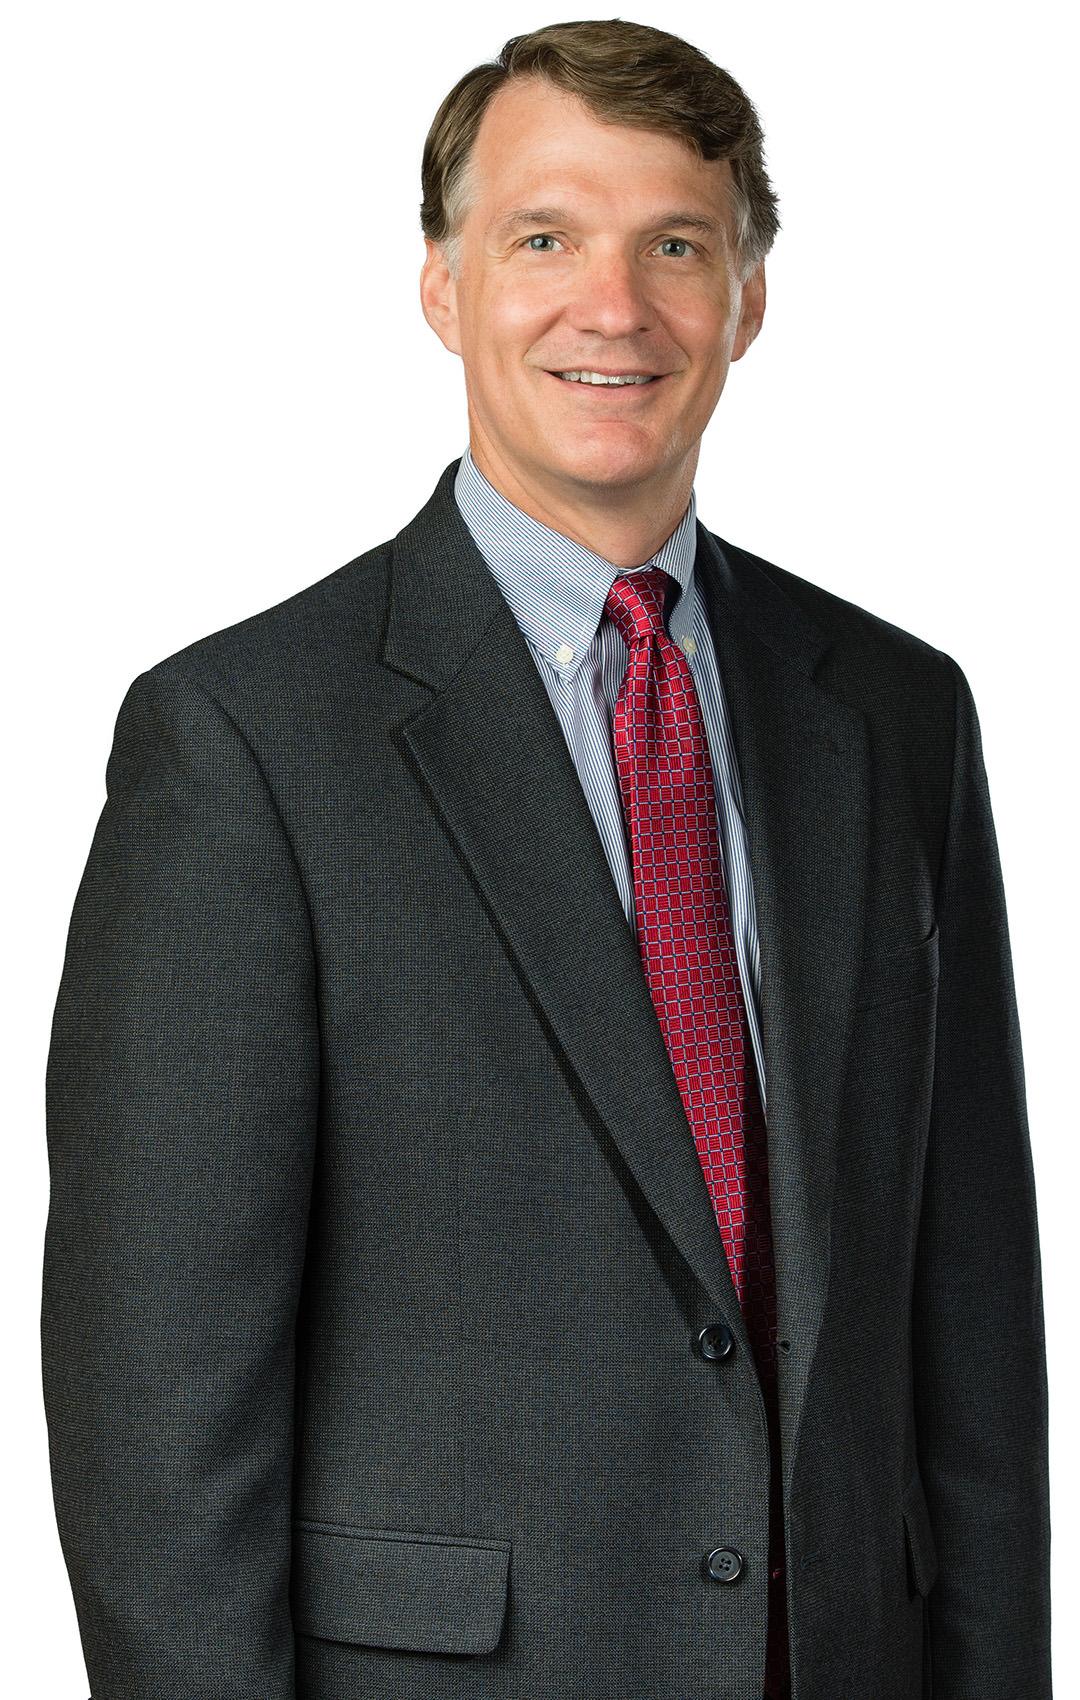 Lee S. Dixon